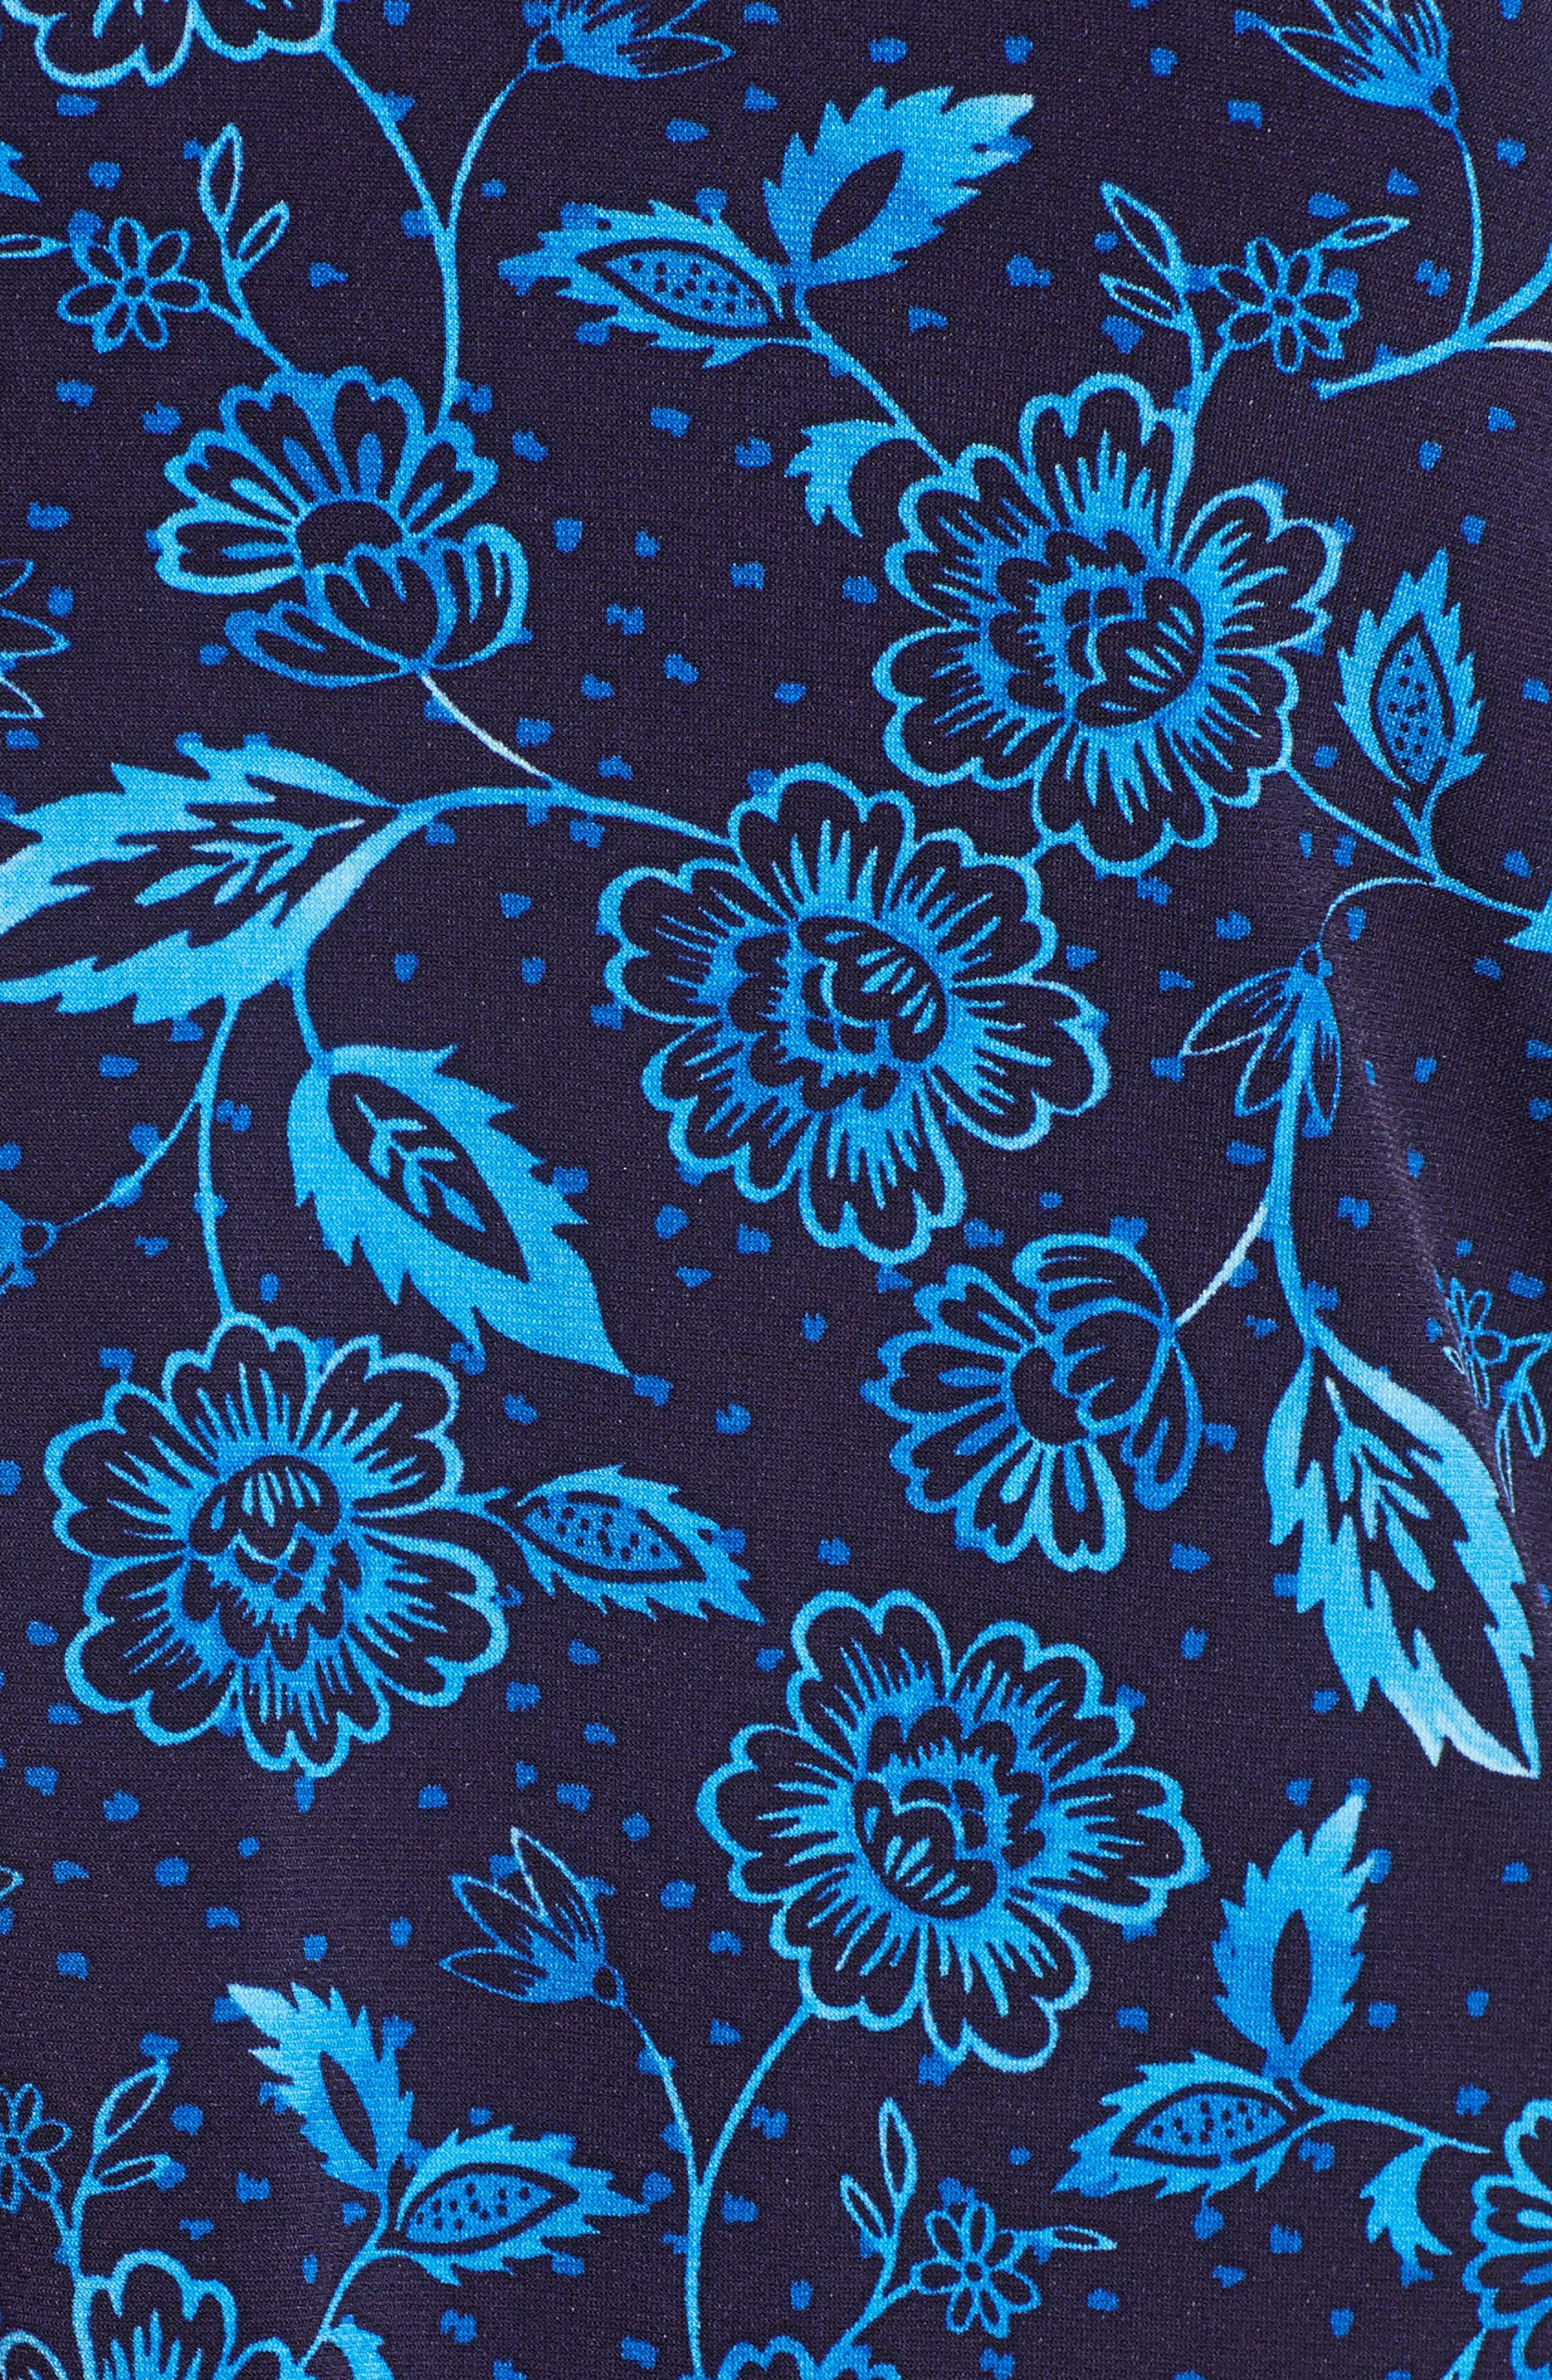 Flowering Vine Top,                             Alternate thumbnail 6, color,                             429